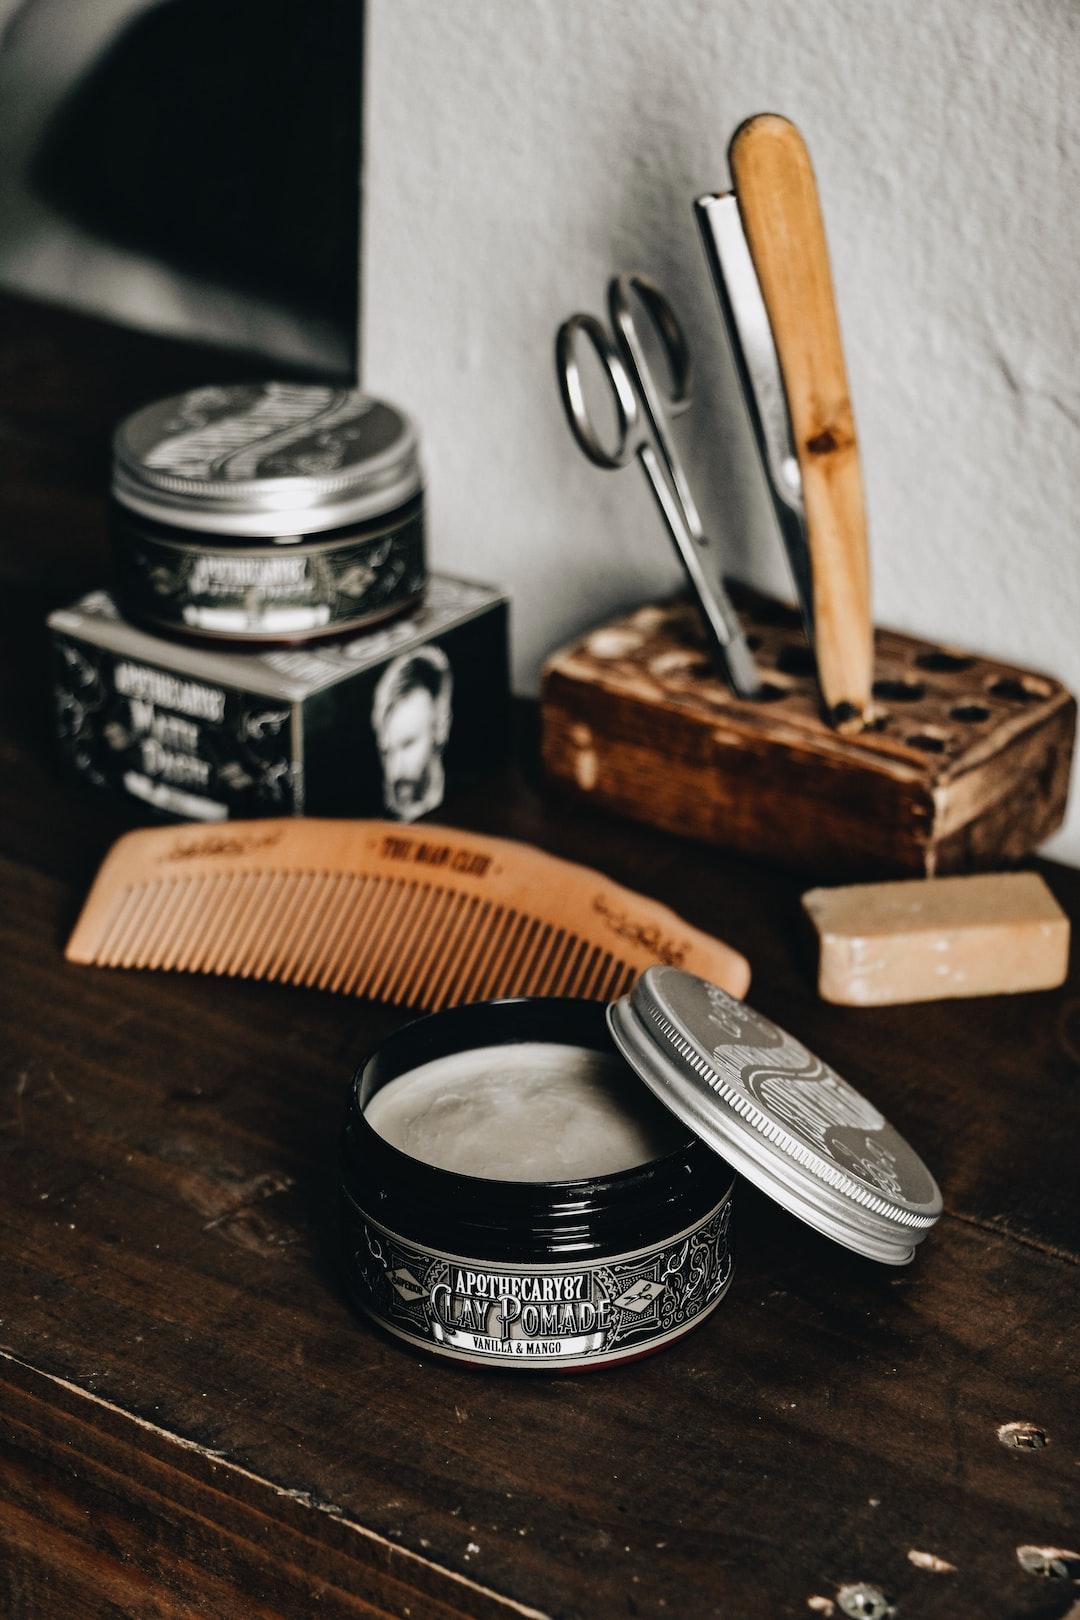 Apothecary 87 - Matte Hair Kit